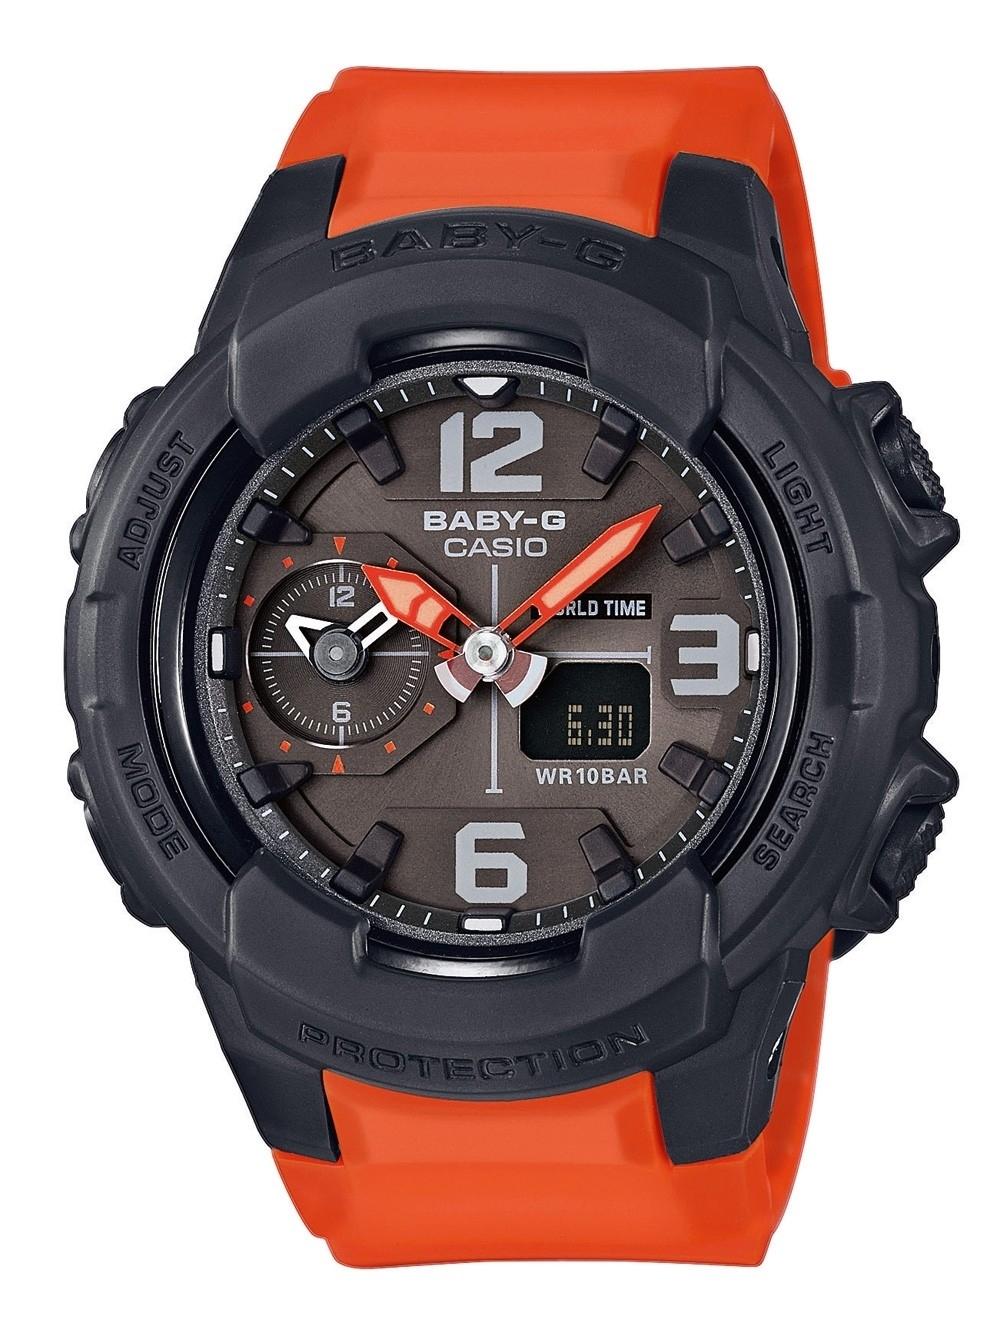 ceas de dama casio bga-230-4ber baby-g 42mm 20atm title=ceas de dama casio bga-230-4ber baby-g 42mm 20atm